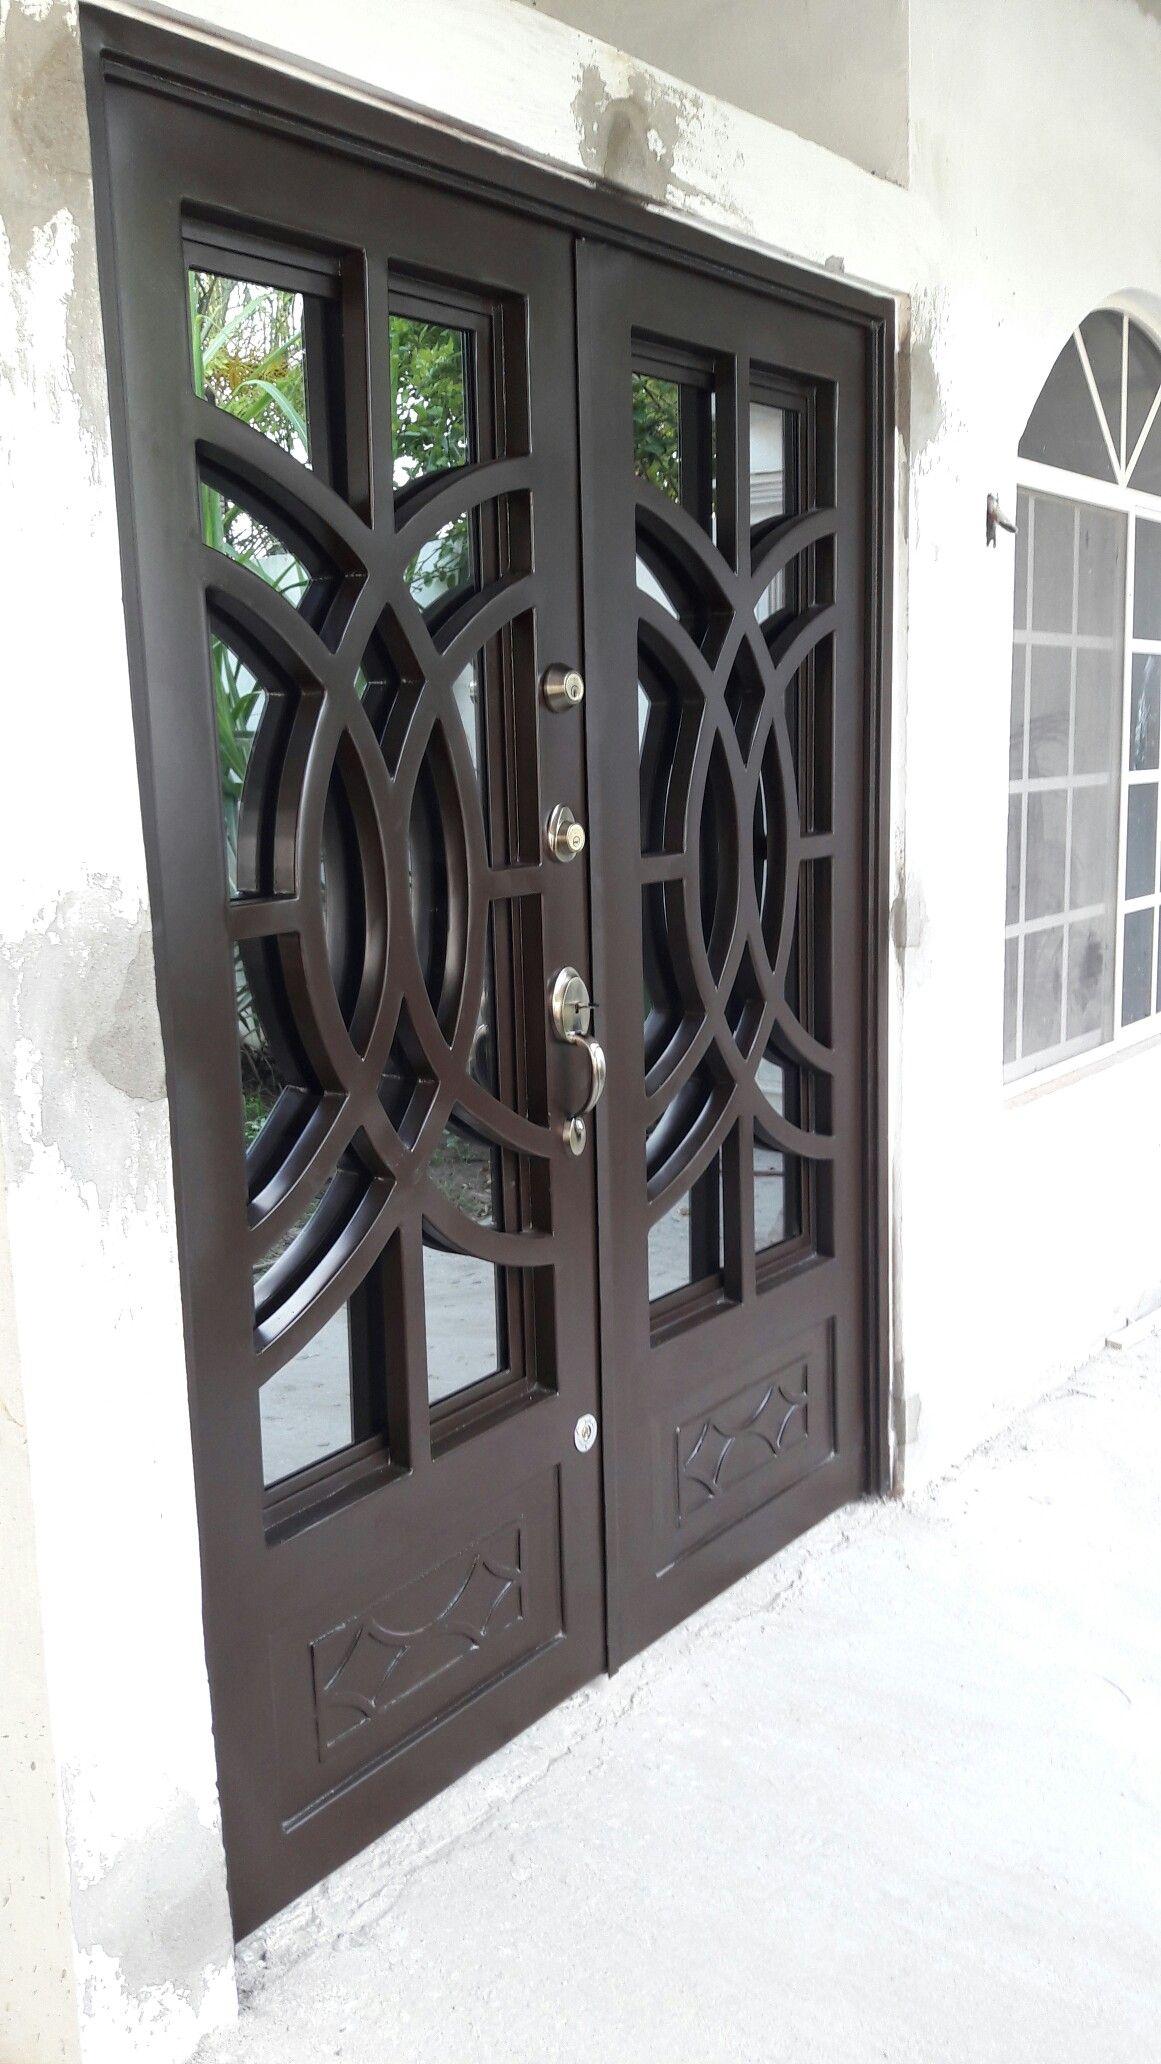 Puerta Minimalista Diseno De Puerta De Madera Diseno De Puerta De Hierro Diseno De Puertas Modernas